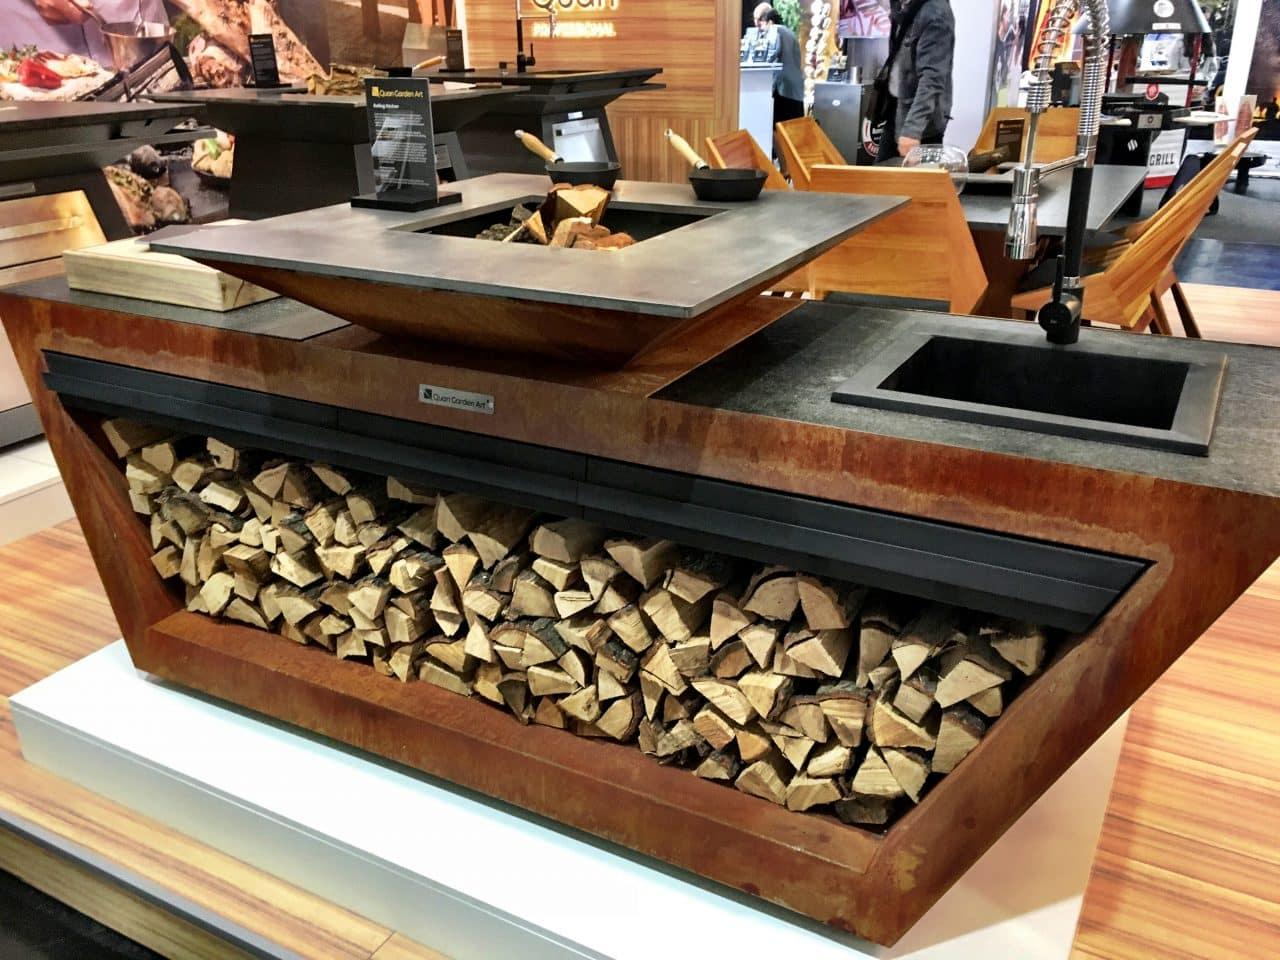 Weber Grill In Outdoor Küche Integrieren : Weber grill in outdoor küche integrieren die grilltrends